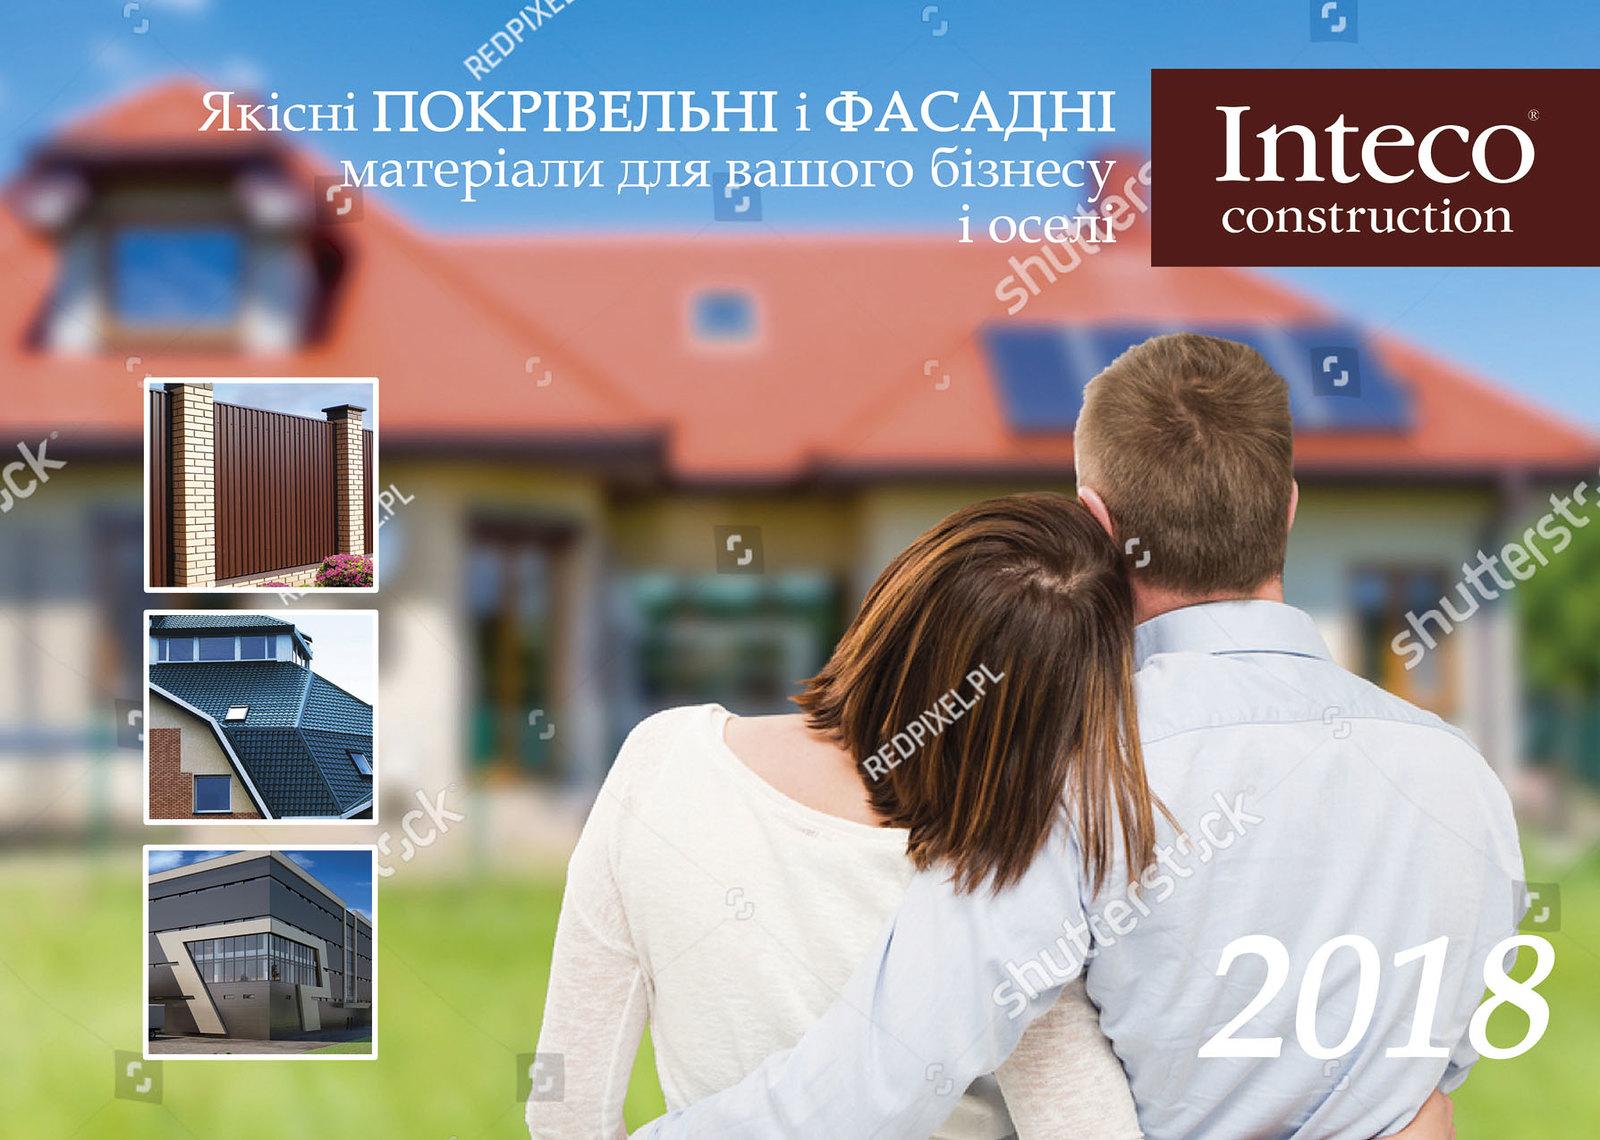 (01) Kalend Inteco 01 verh 07